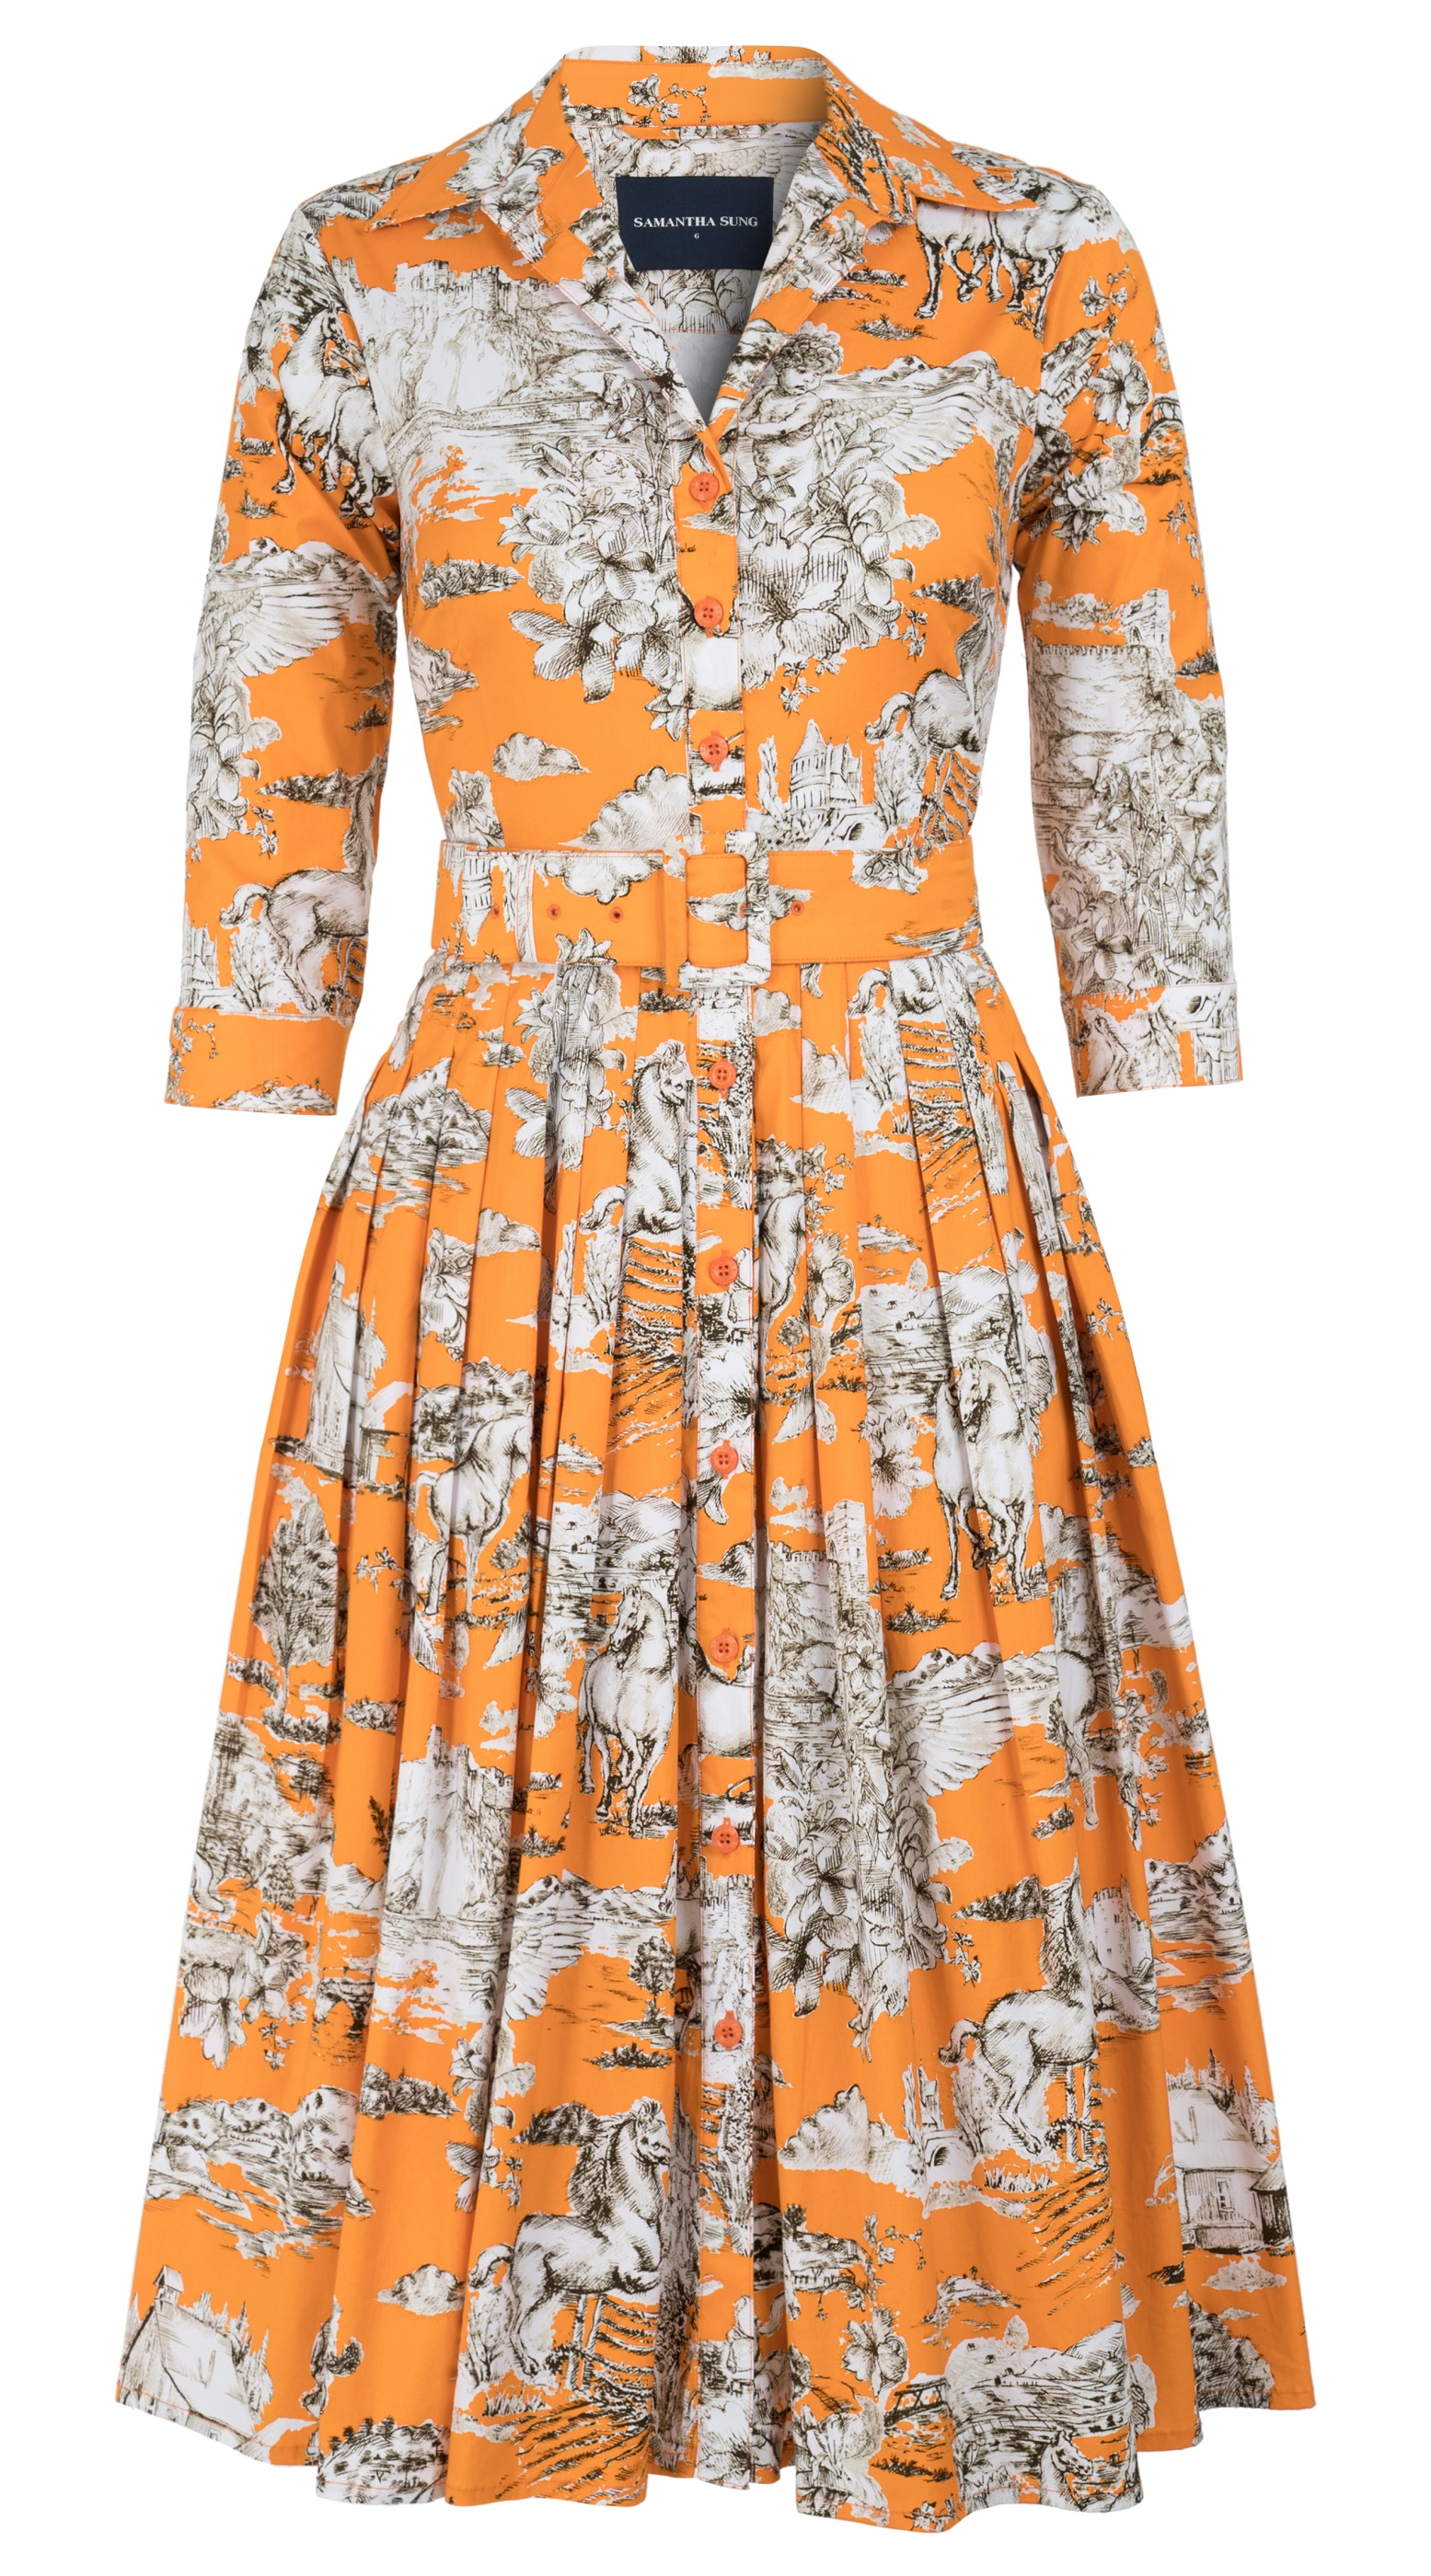 Da Vinci Toile Multi_Orange Khaki_Audrey Dress #2 Shirt Collar 3-4 Sleeve_Long_CS_Front-2